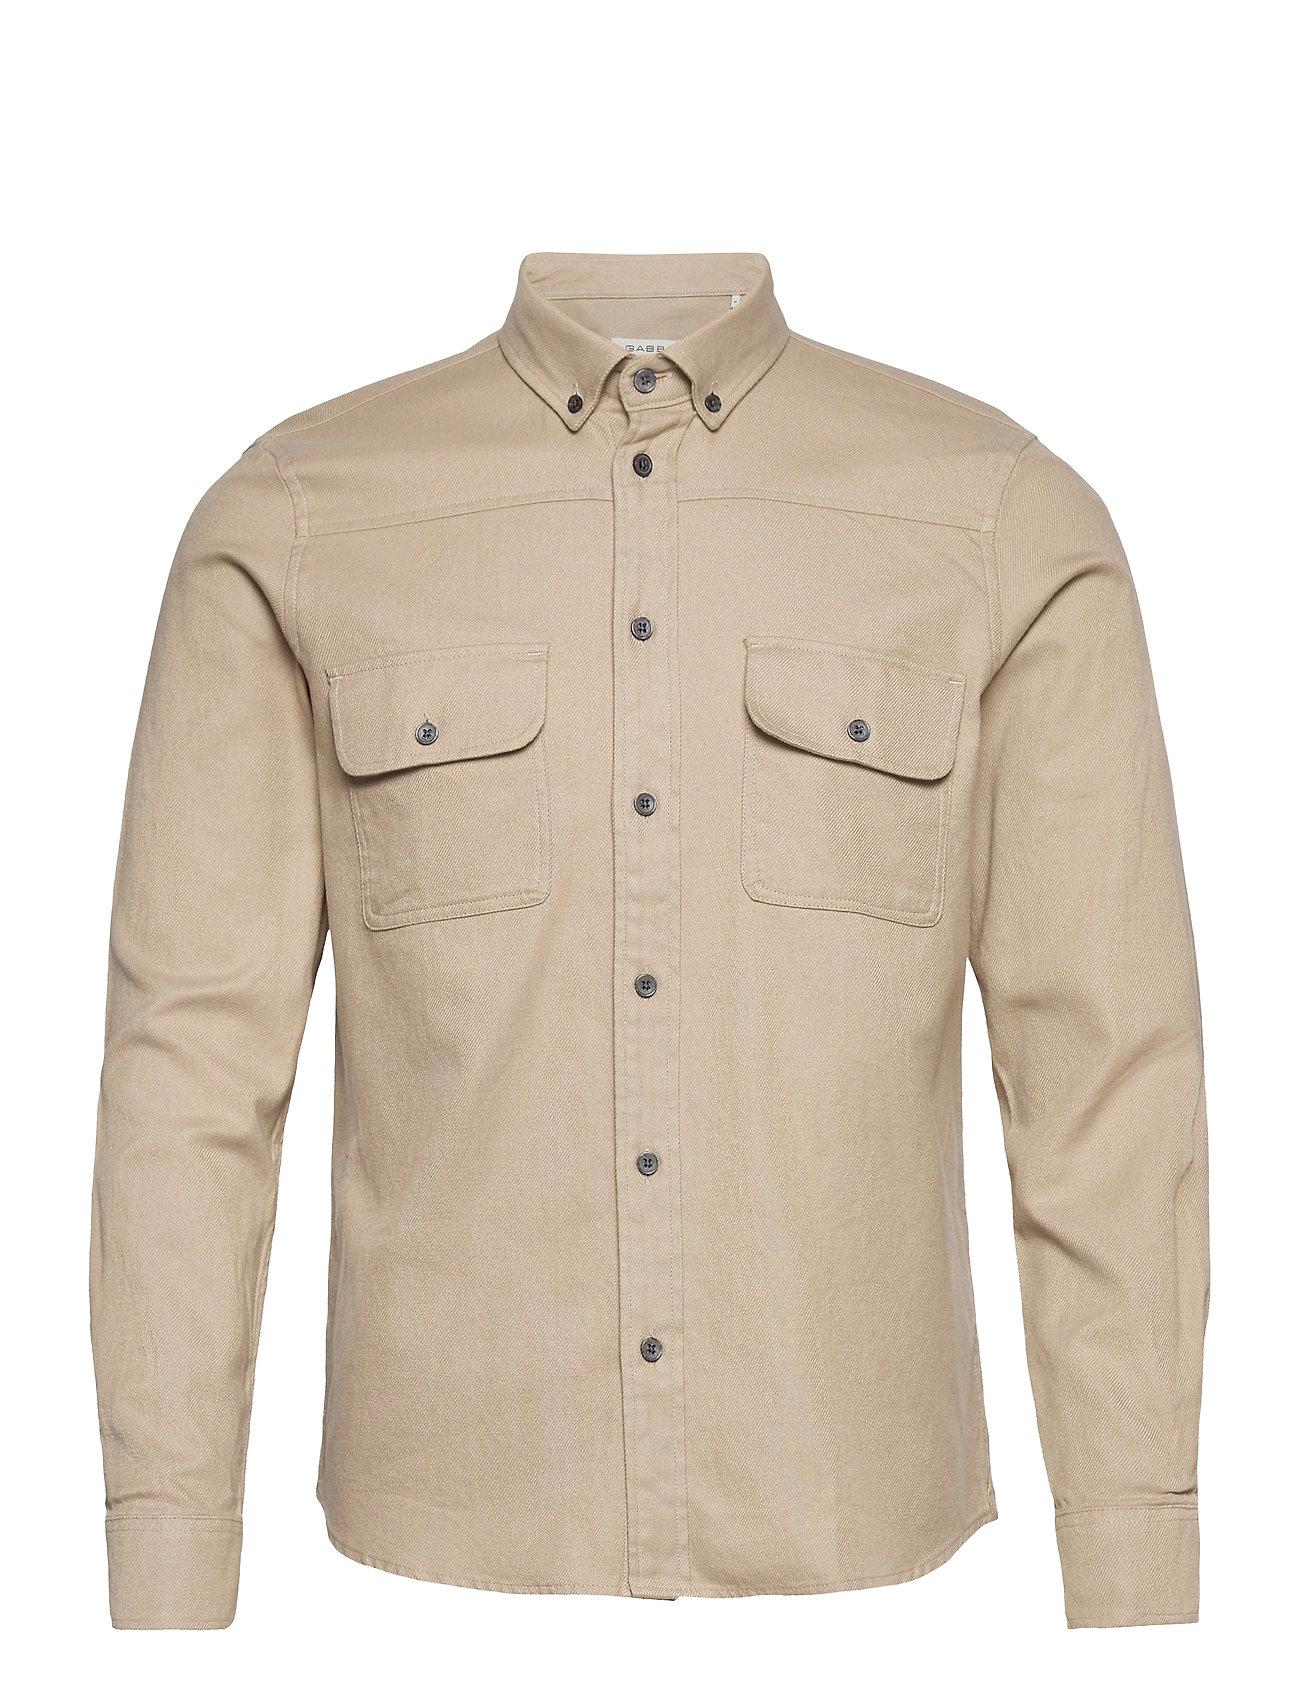 Image of Harbin Ls Shirt Skjorte Casual Beige Gabba (3493873951)